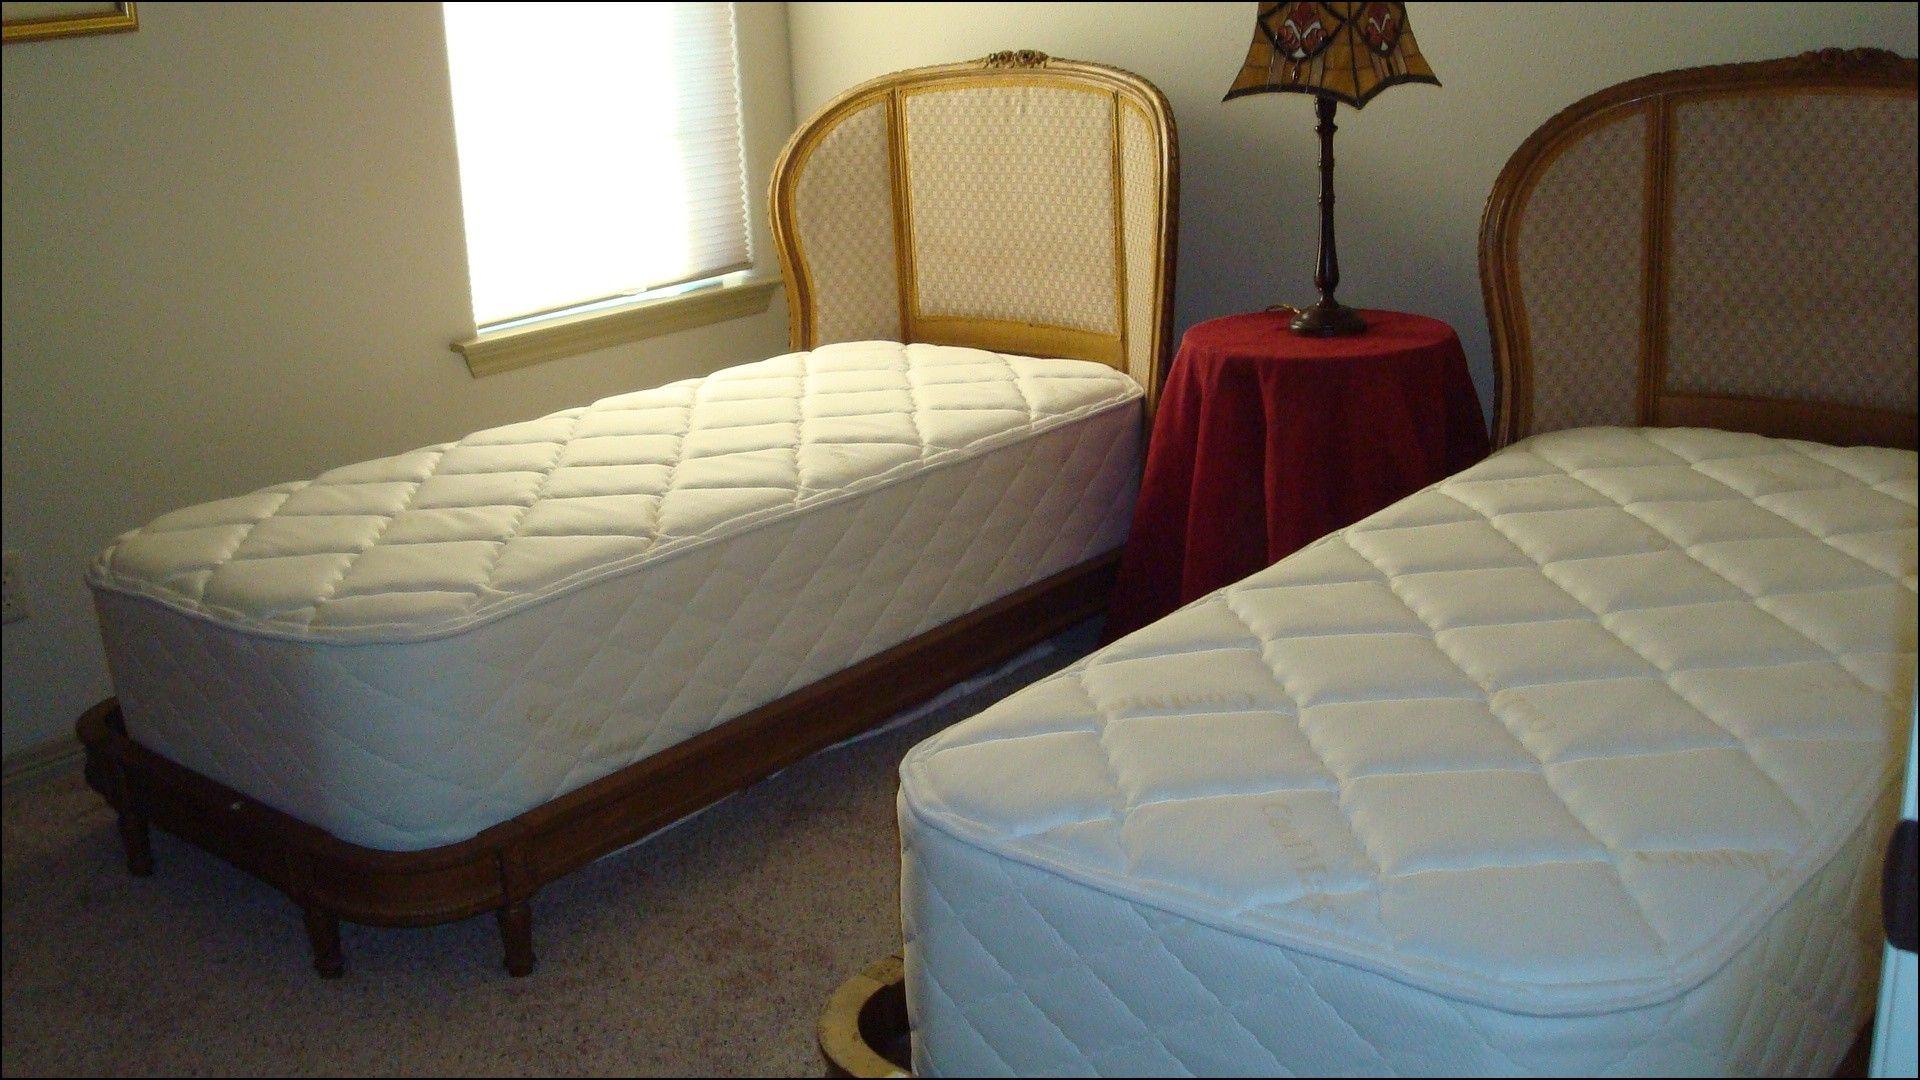 Custom Mattresses For Antique Beds